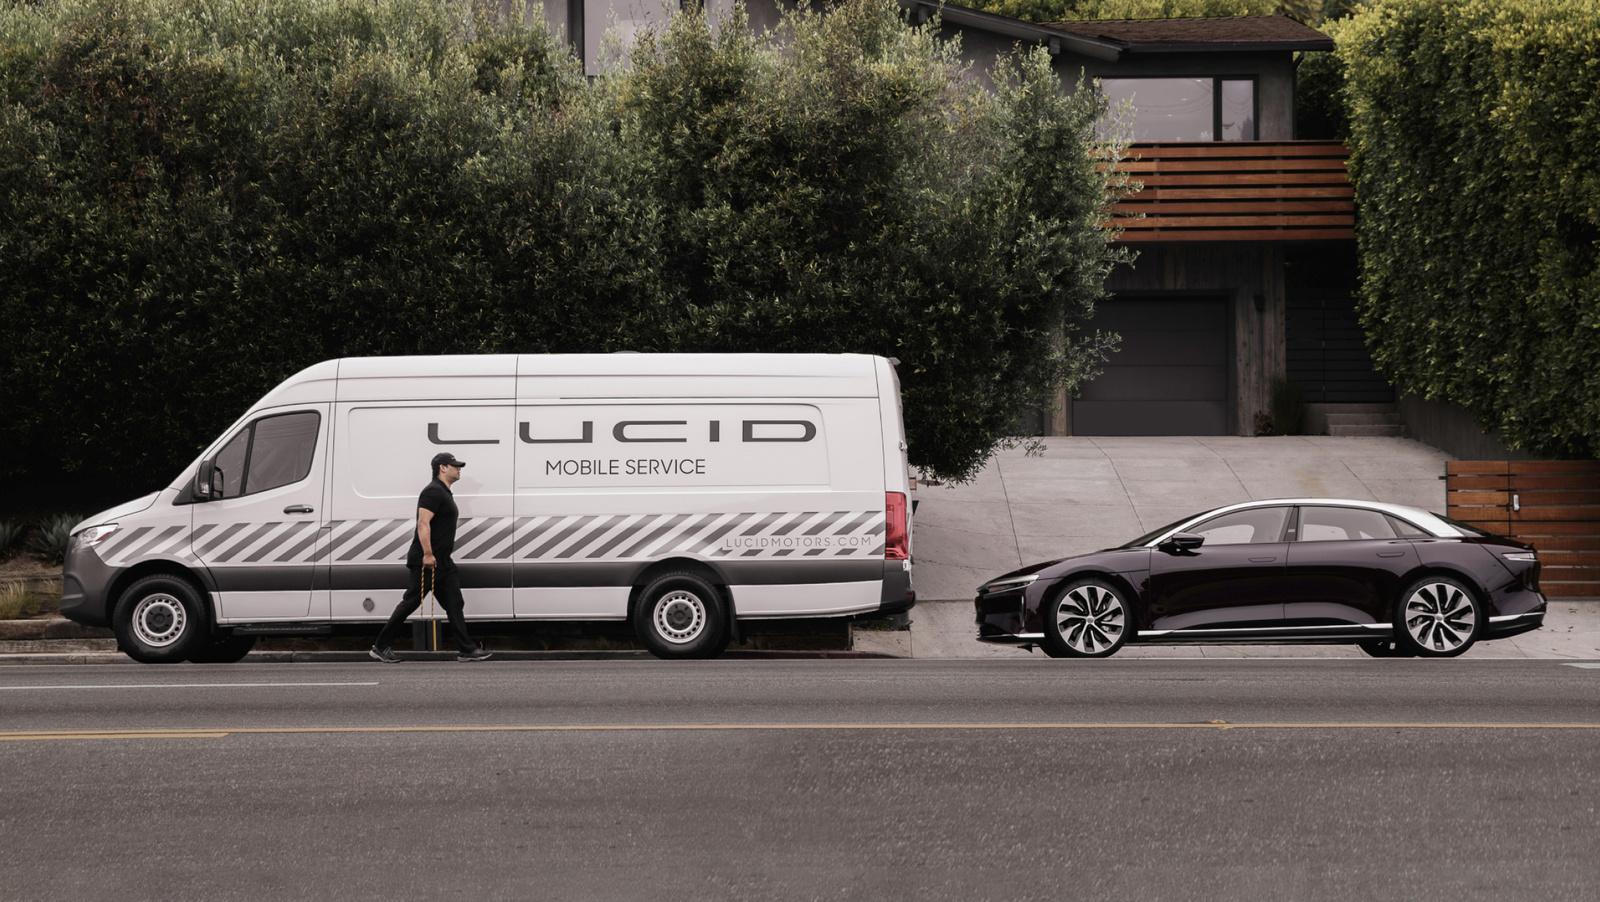 lucid-mobile-service